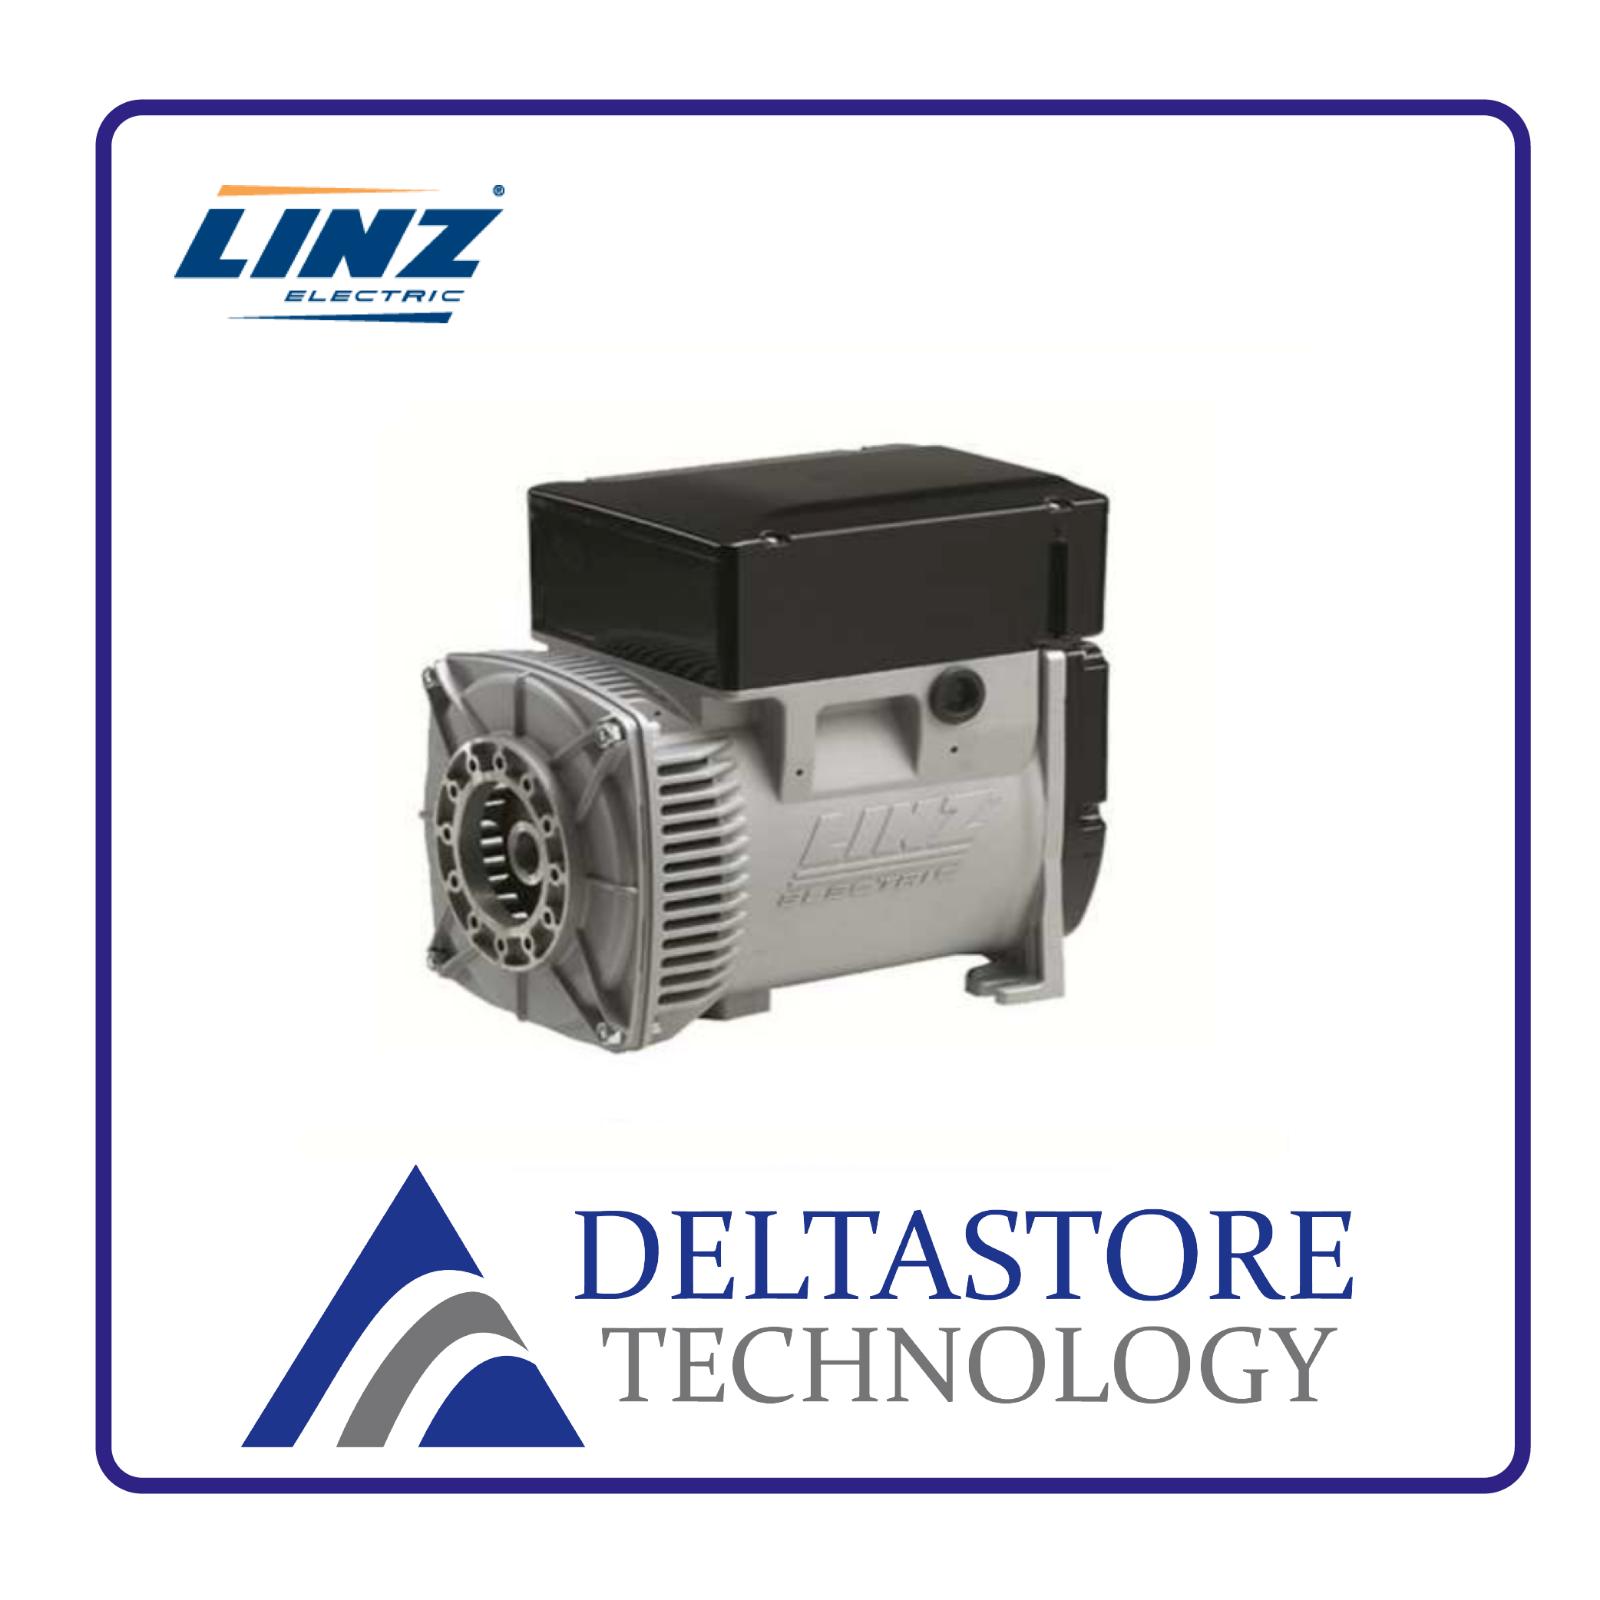 ALTERNATORE LINZ TRIFASEE1S13 4 POLI DA 8 A 20 kVA COMPOUND - FLANGIA A SCELTA